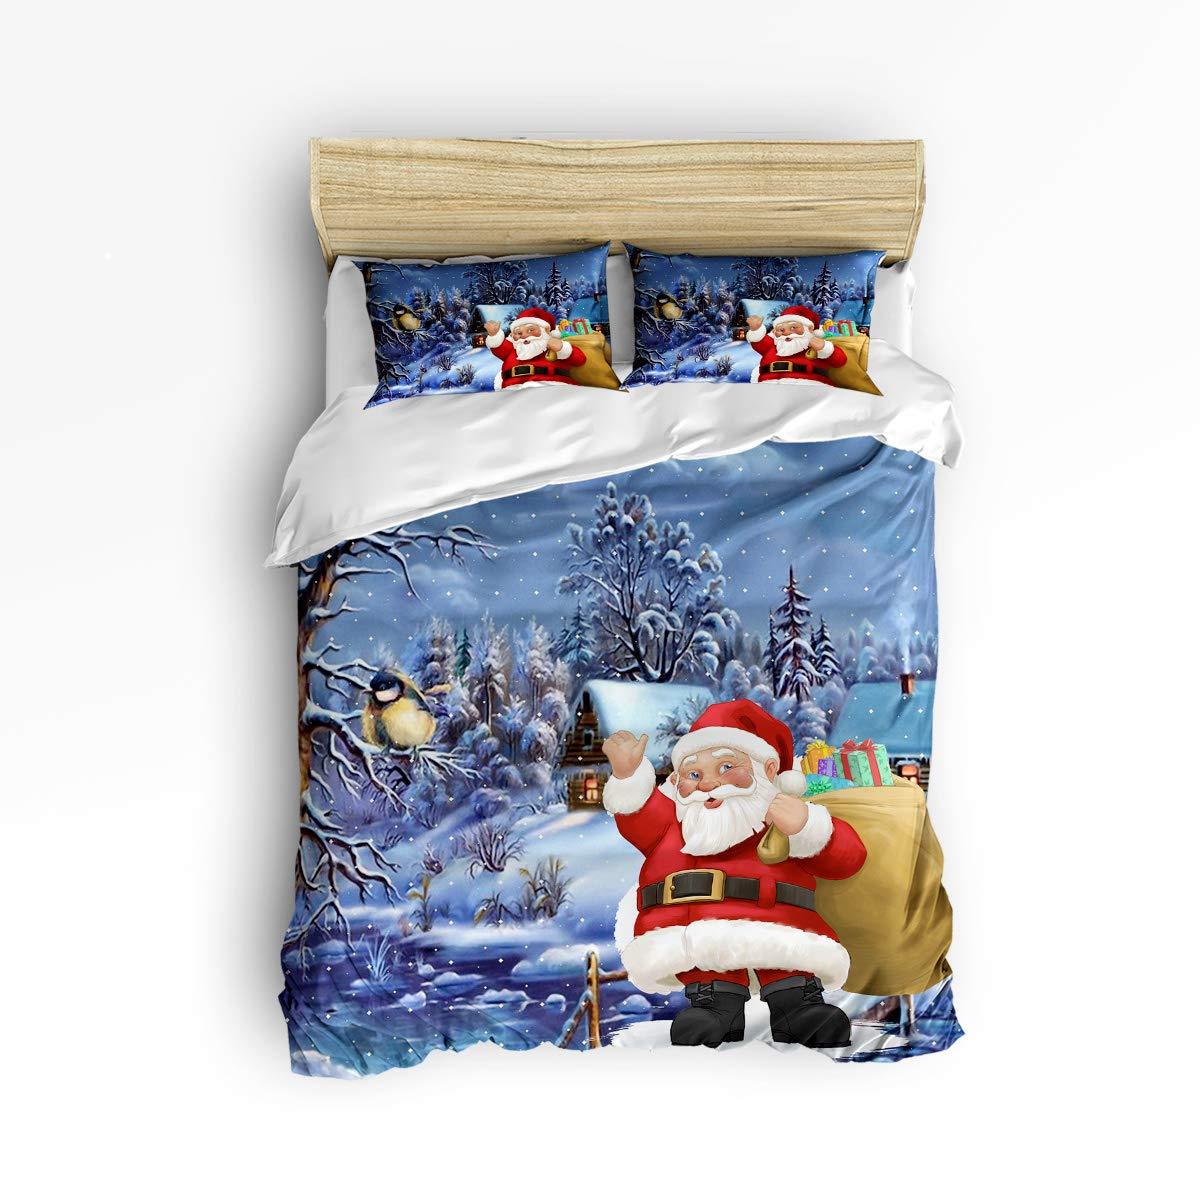 EZON-CH ソフト 子供用 掛け布団カバーセット ティーンキッズ 女の子 男の子 可愛いサンタクロース メリークリスマス 雪のパターン 寝具セット 掛け布団カバー1枚と枕カバー2枚付き Queen Size 181110WHLEZONWHLSJTSLXM01688SJSCEZN B07KDC7Z22 Christmas766lezn0561 Queen Size